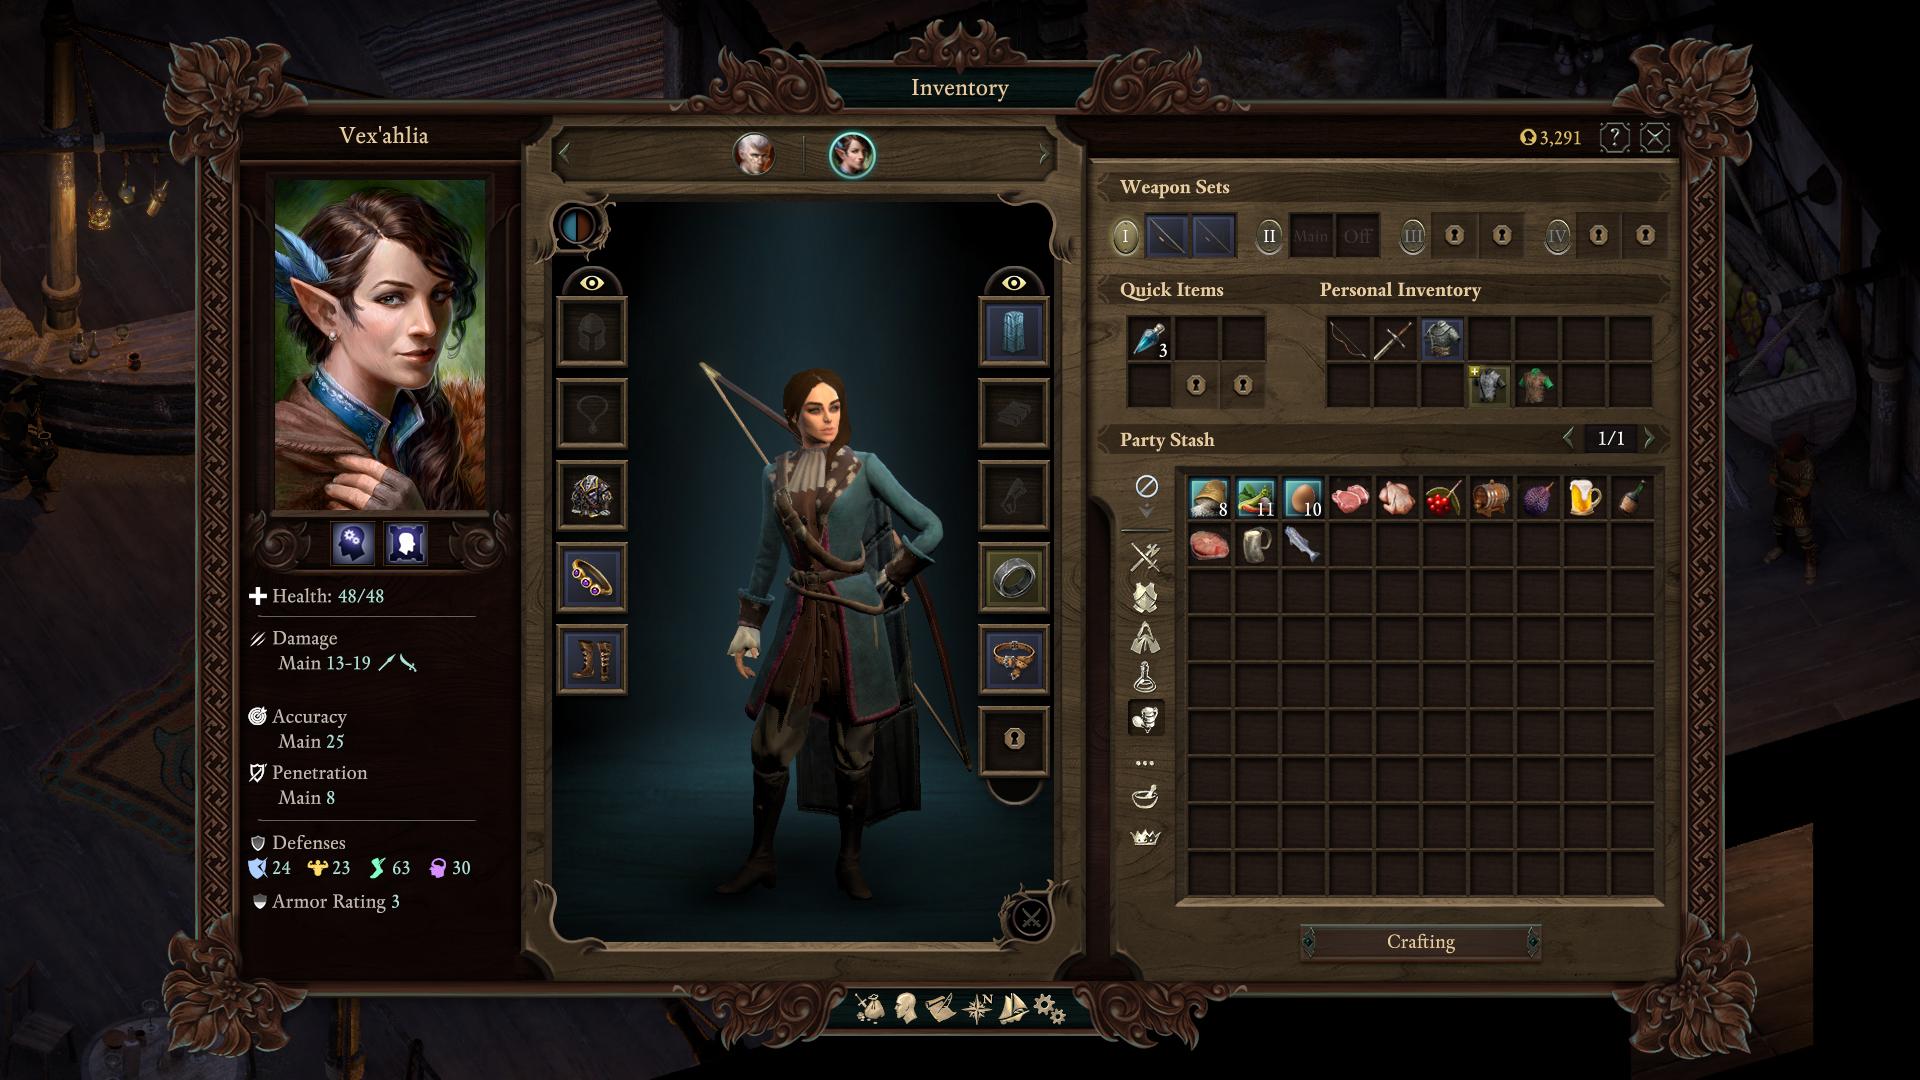 Pillars of Eternity II: Deadfire - Critical Role Pack on Steam